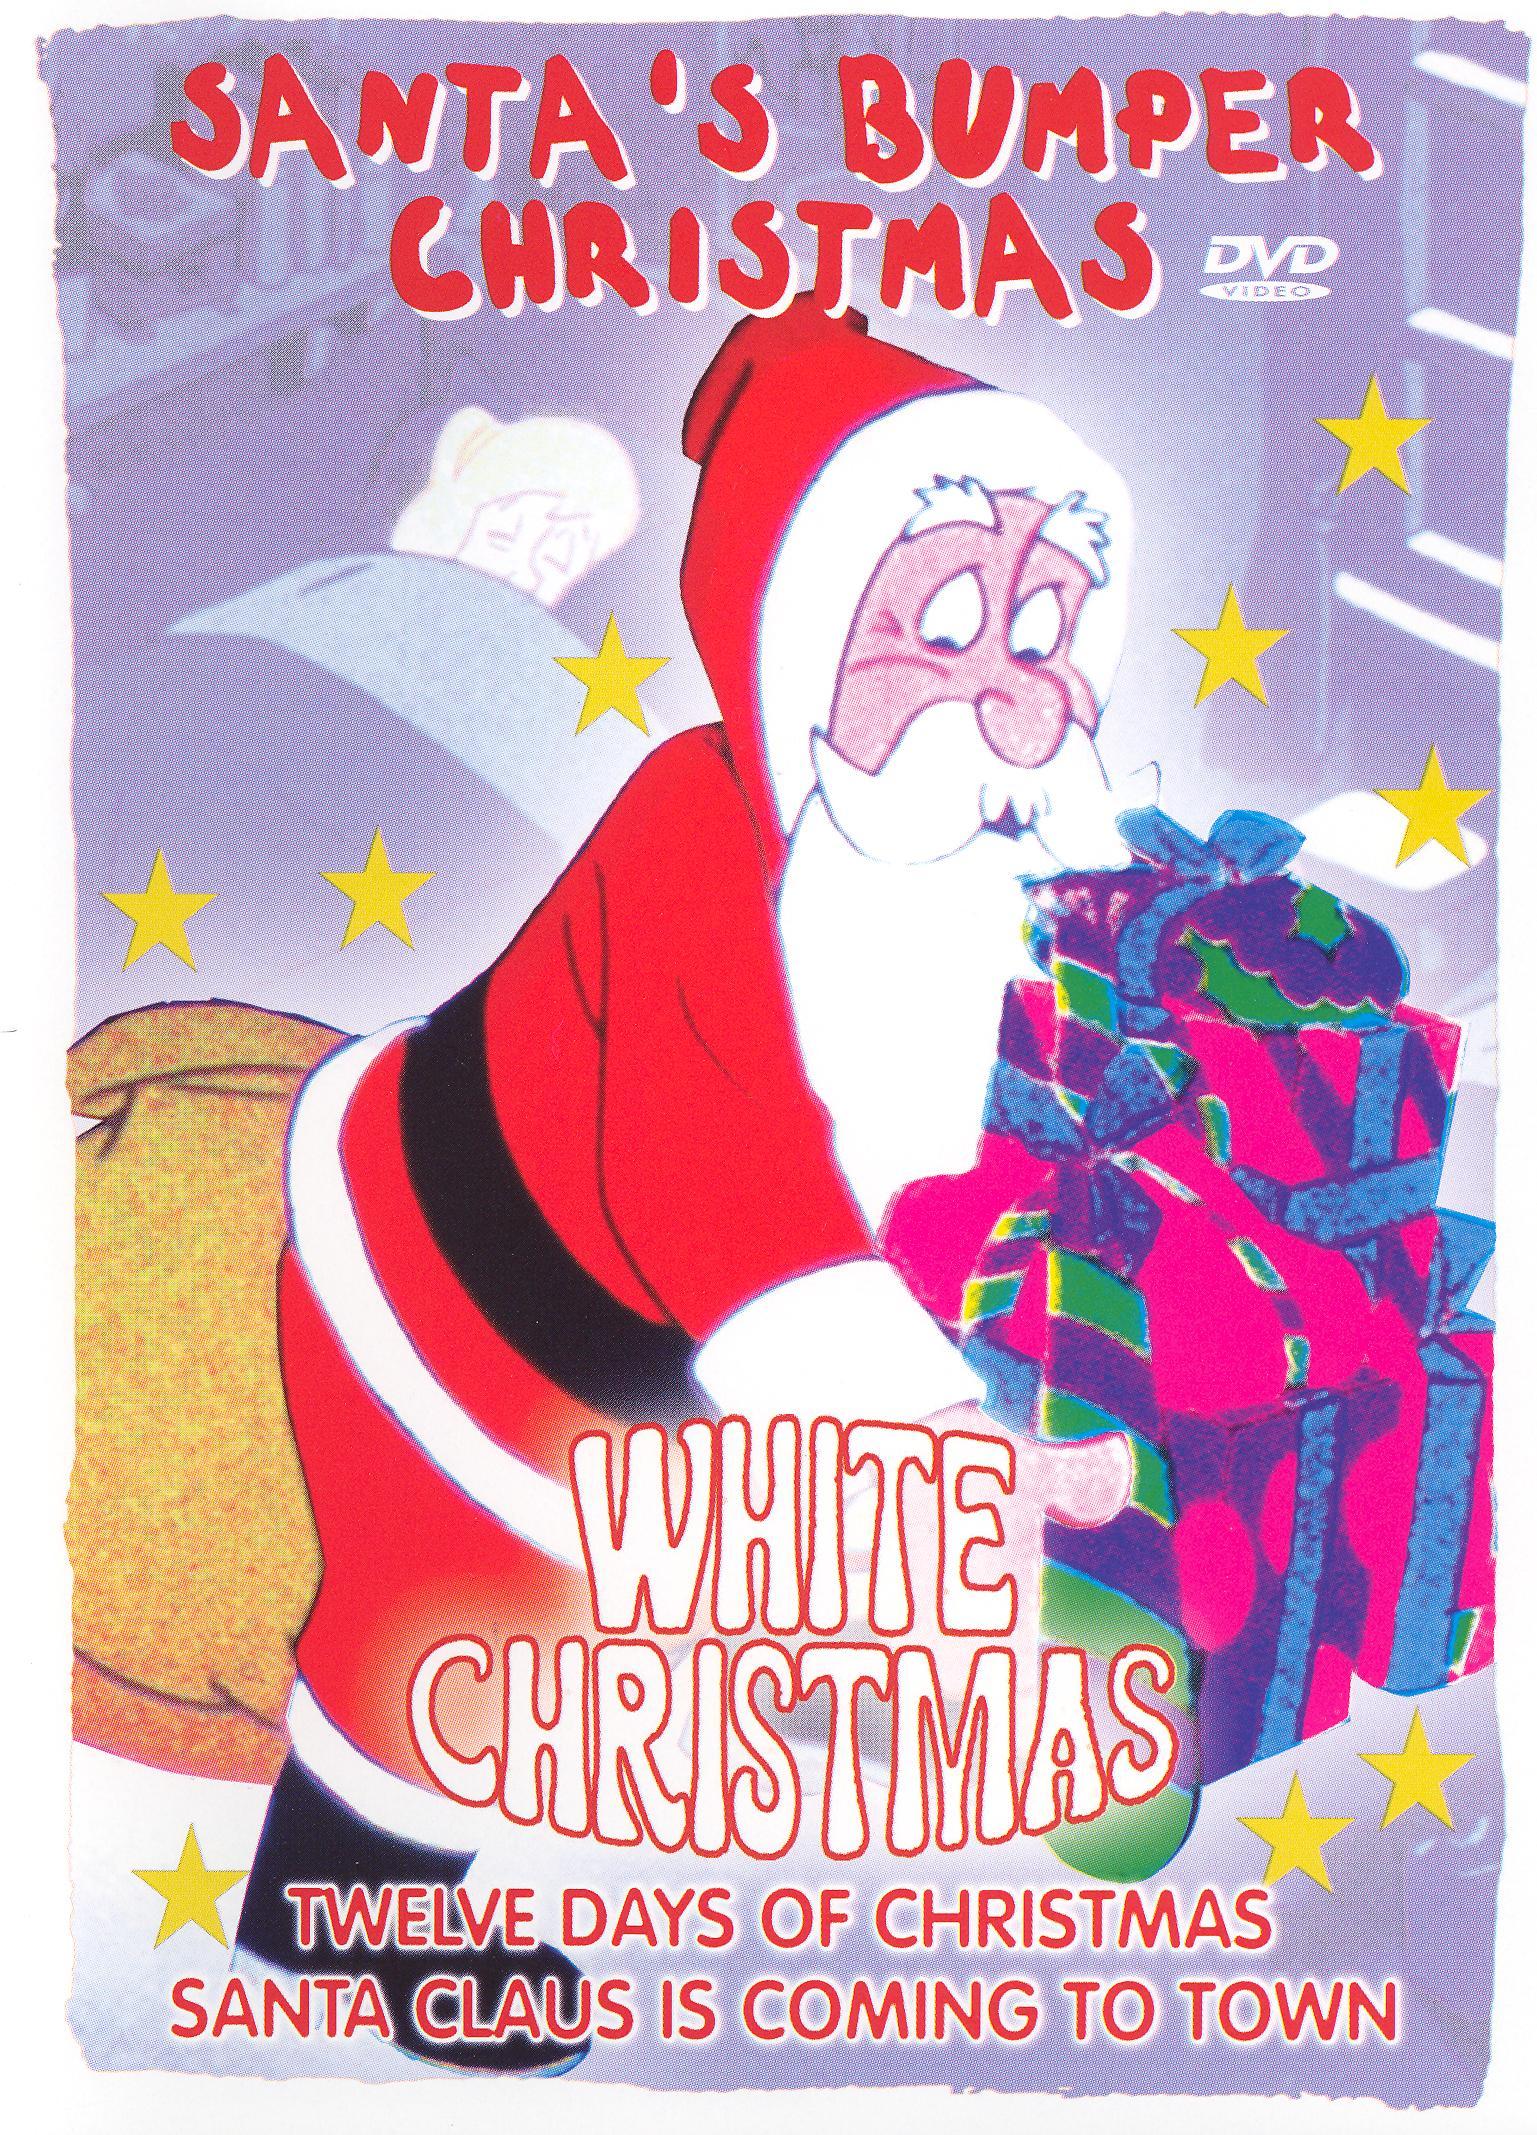 Santa's Bumper Christmas: White Christmas/Twelve Days of Christmas/Santa CLaus is Coming to Town